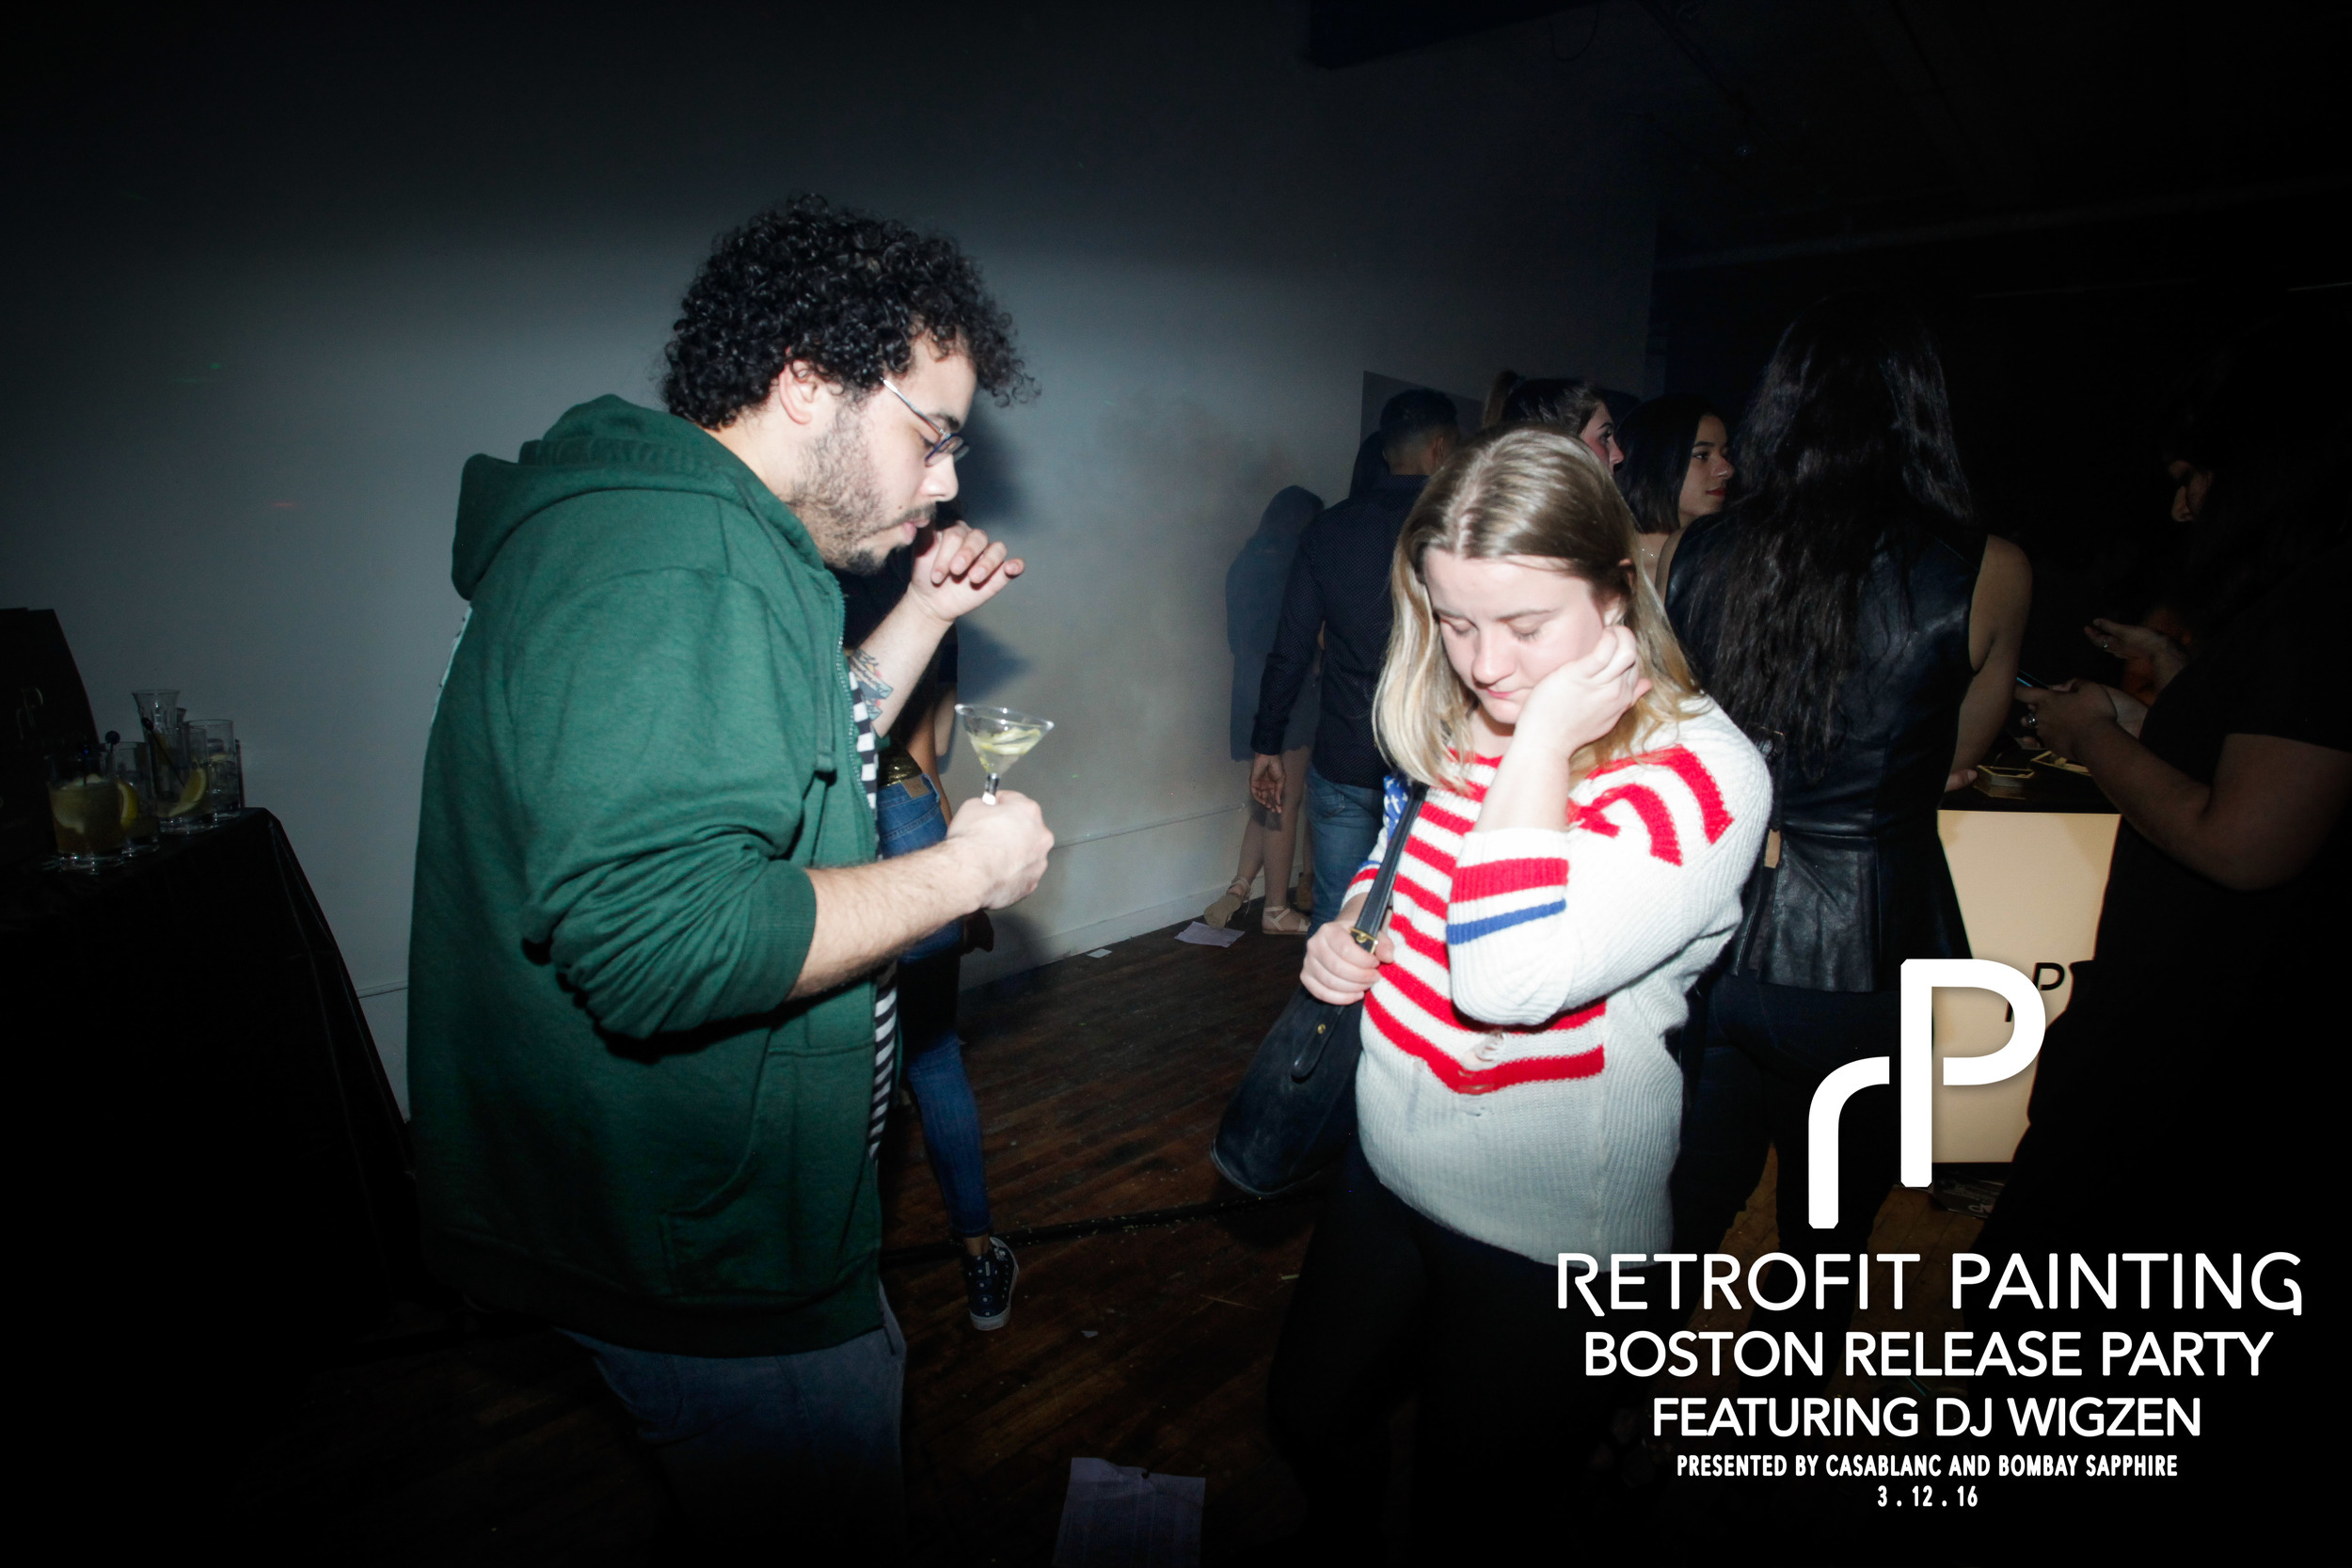 Retrofit Painting Boston Release Party 0155.jpg